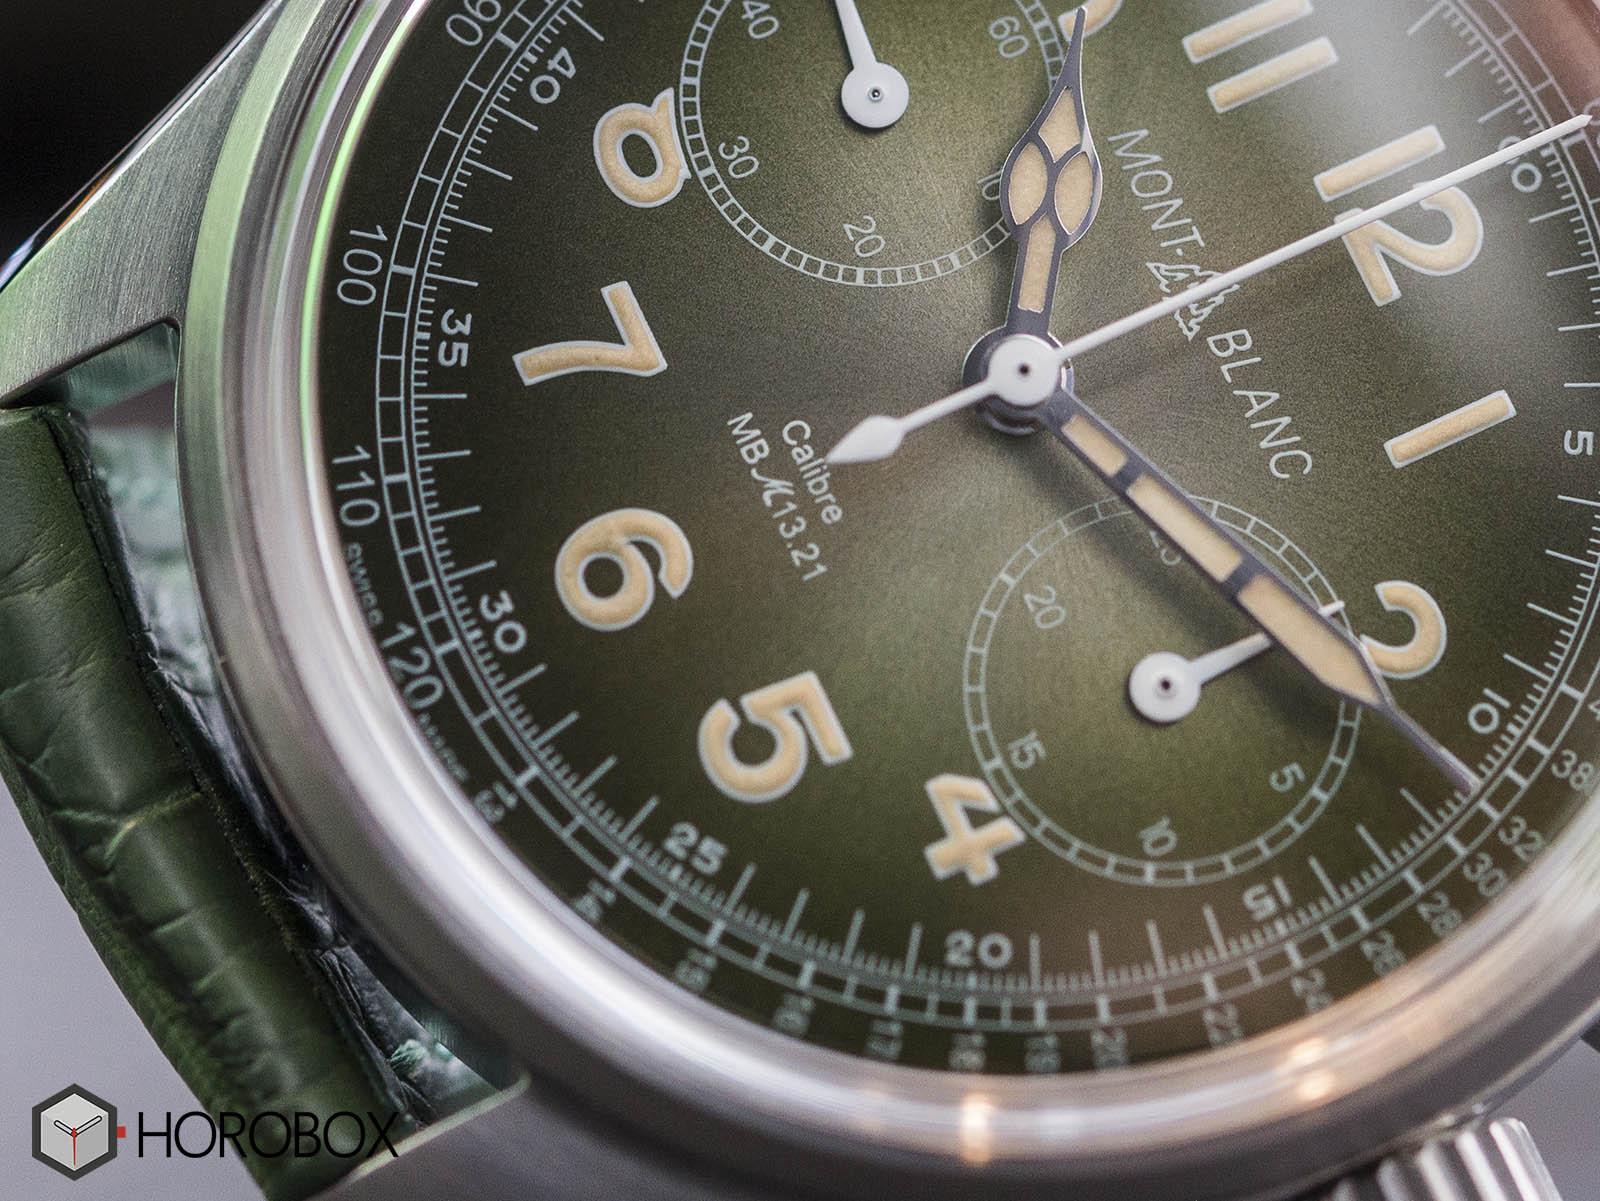 117834-Montblanc-1858-Monopusher-Chronograph-Sihh-2018-3.jpg